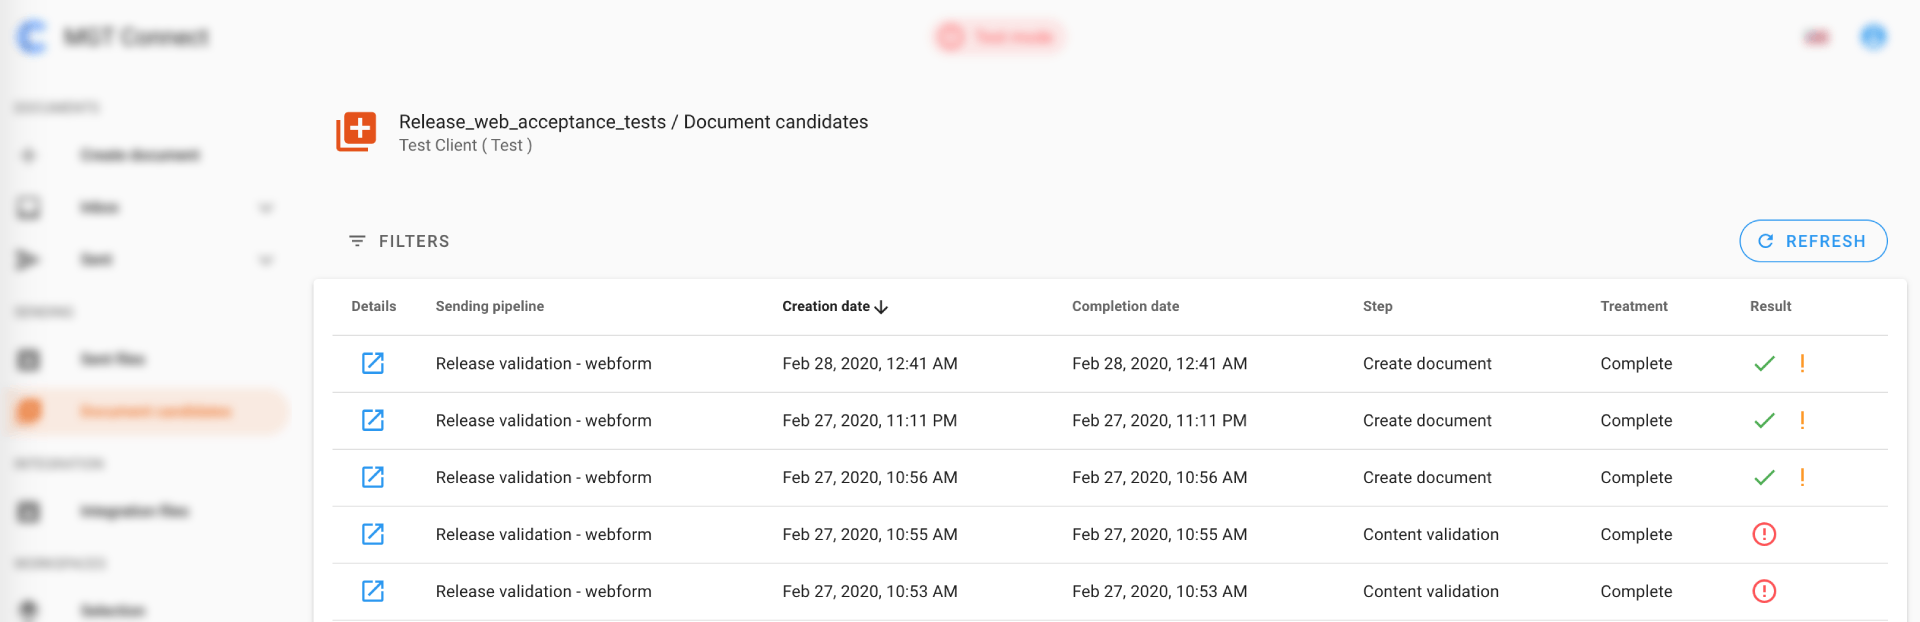 candidates list